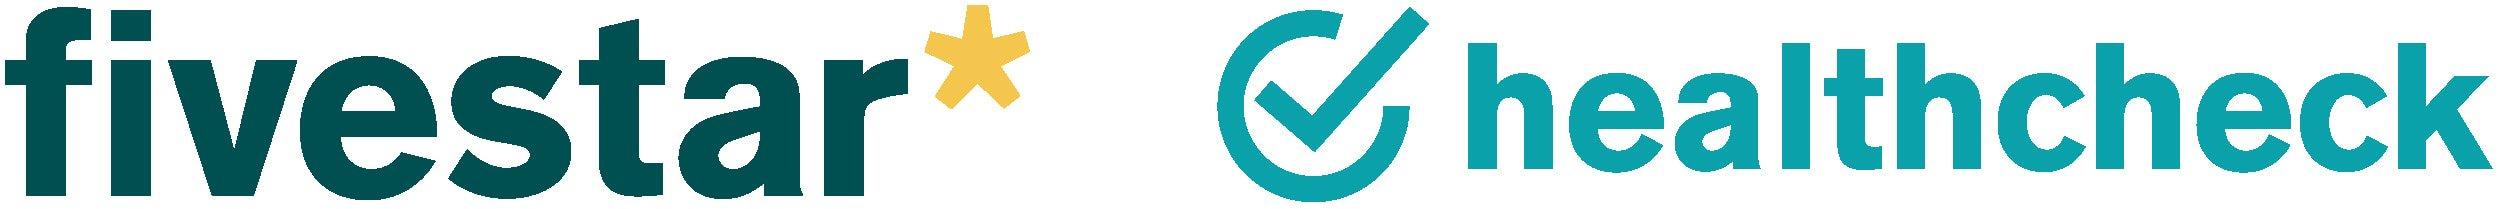 fivestar and salesforce healthcheck logo